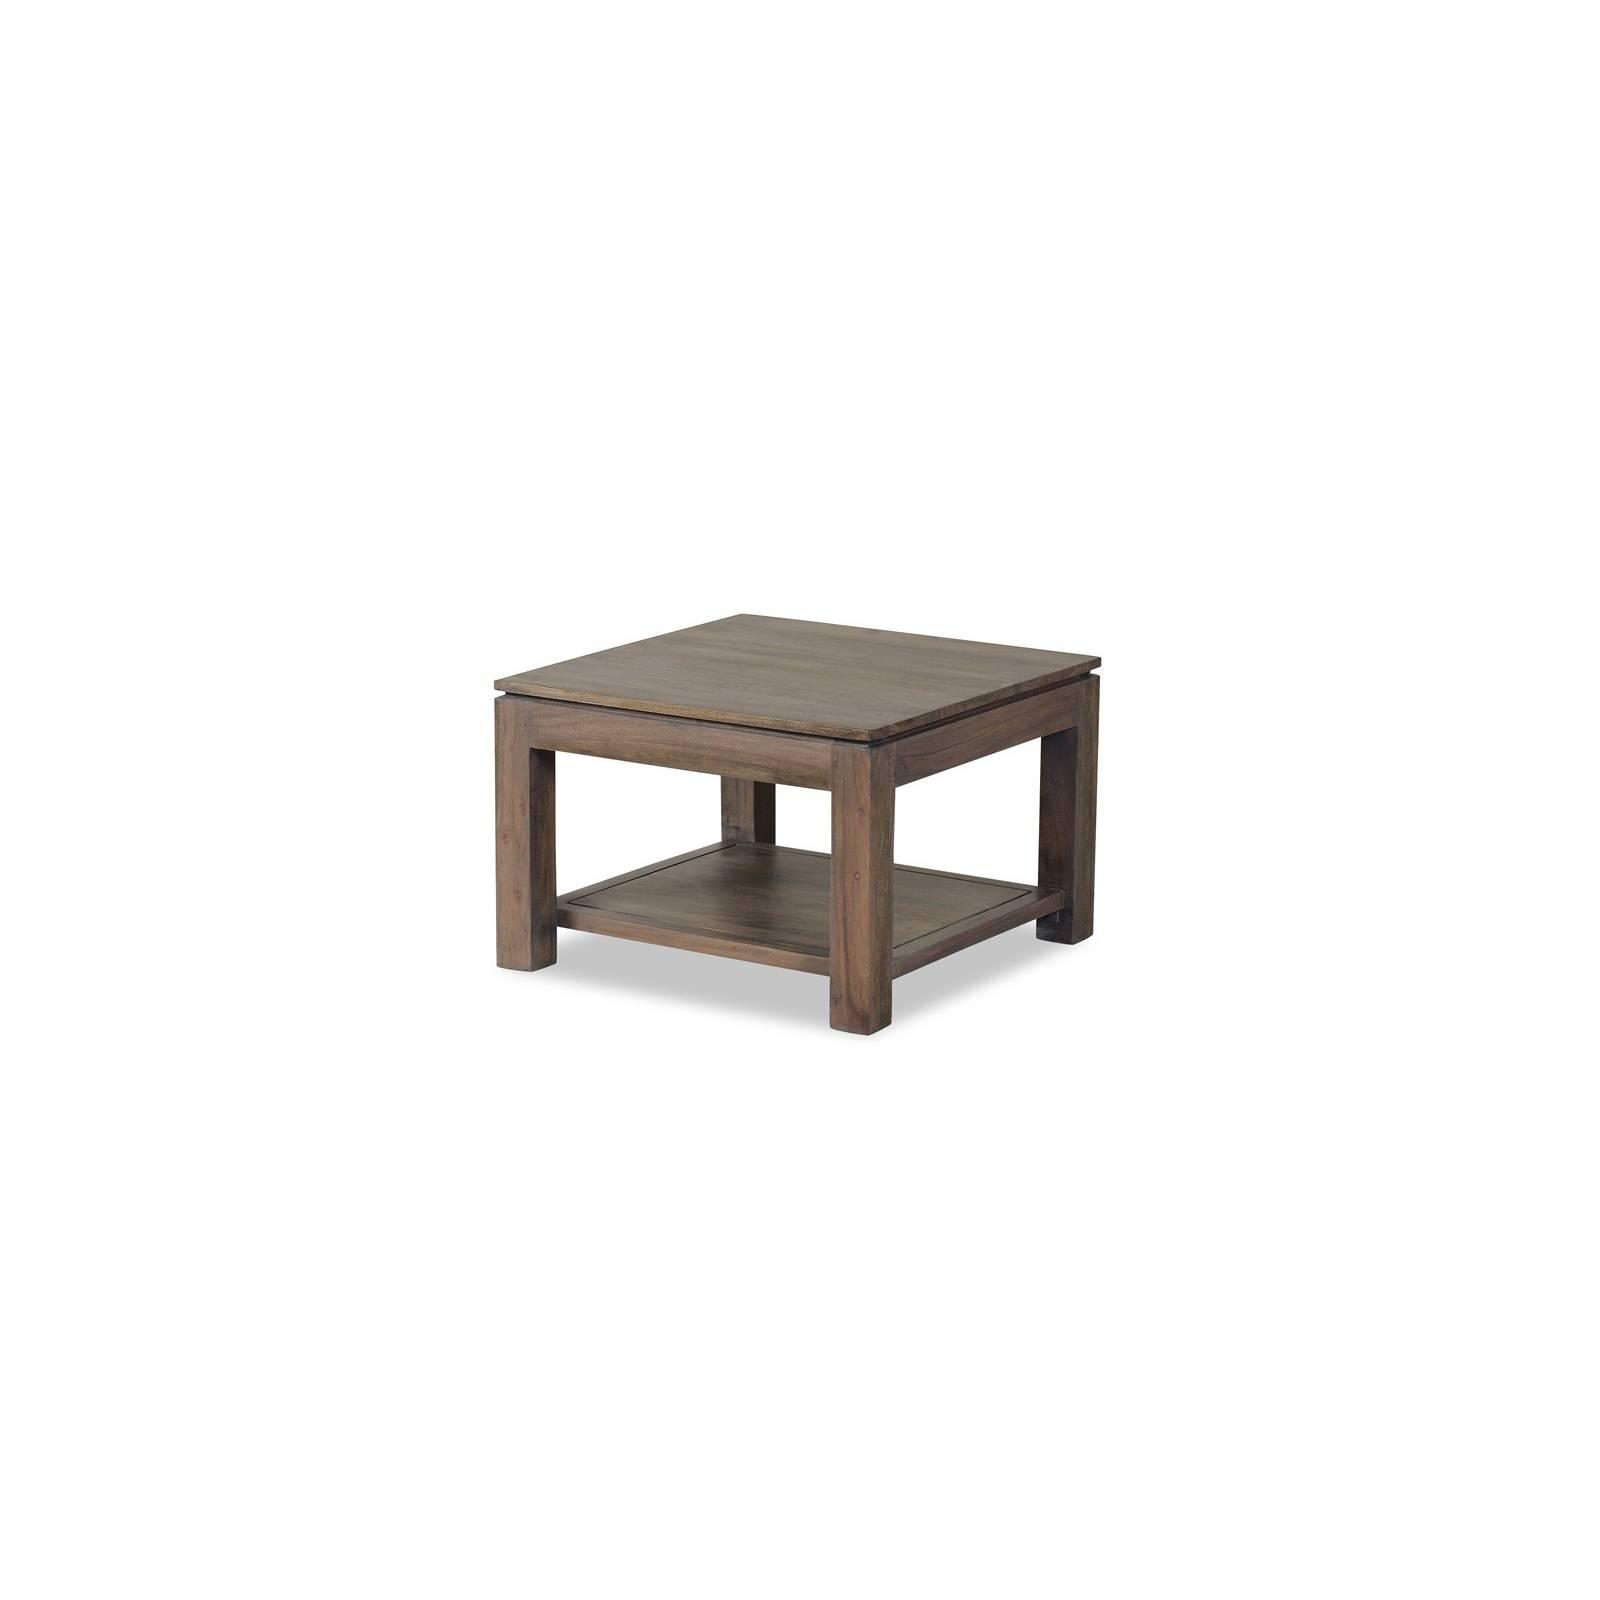 Bout De Canapé Tara Grisée Acacia - meuble design haut de gamme